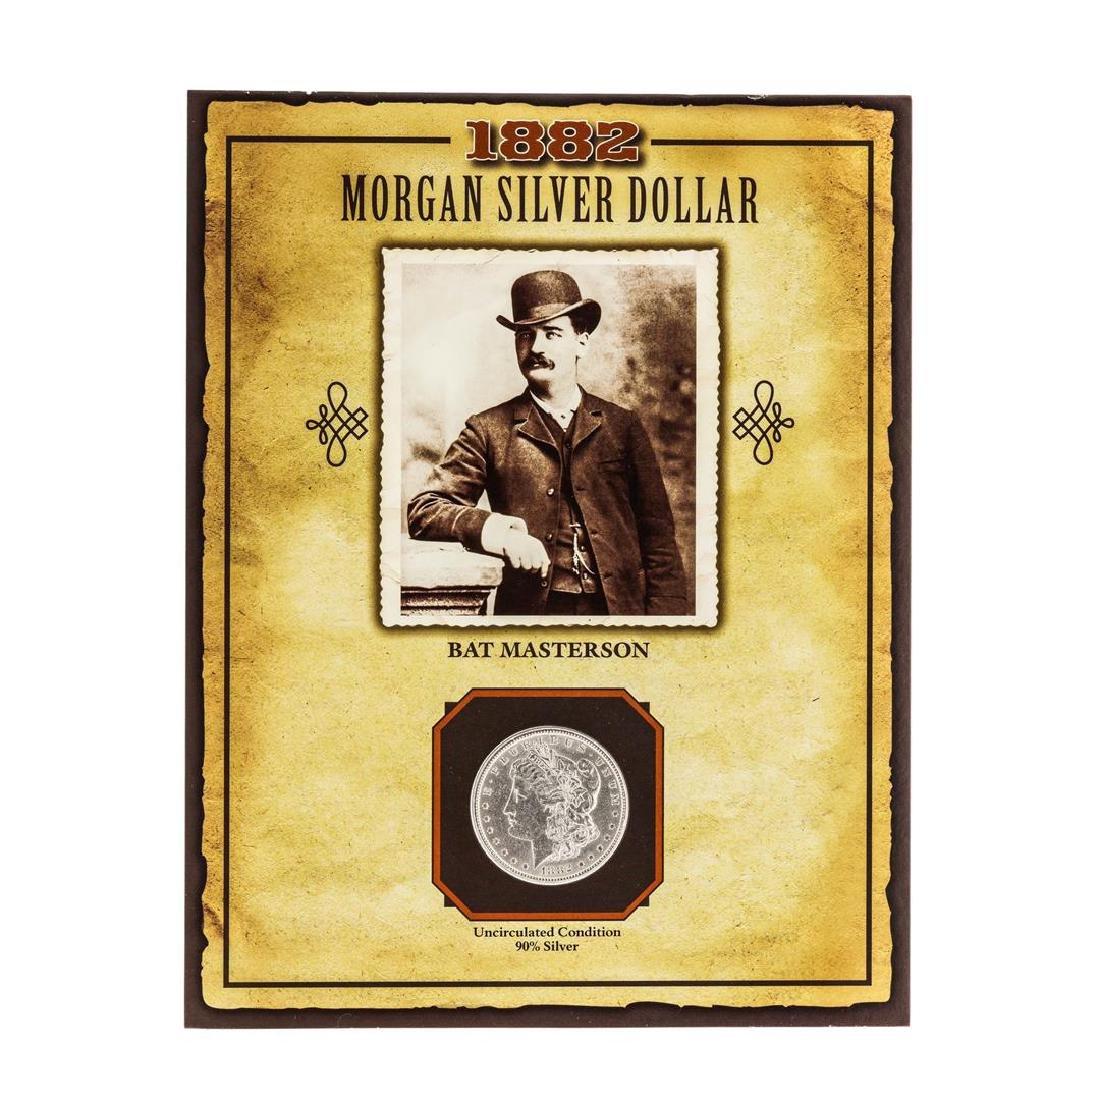 1882 $1 Morgan Silver Dollar Coin with Bat Masterson